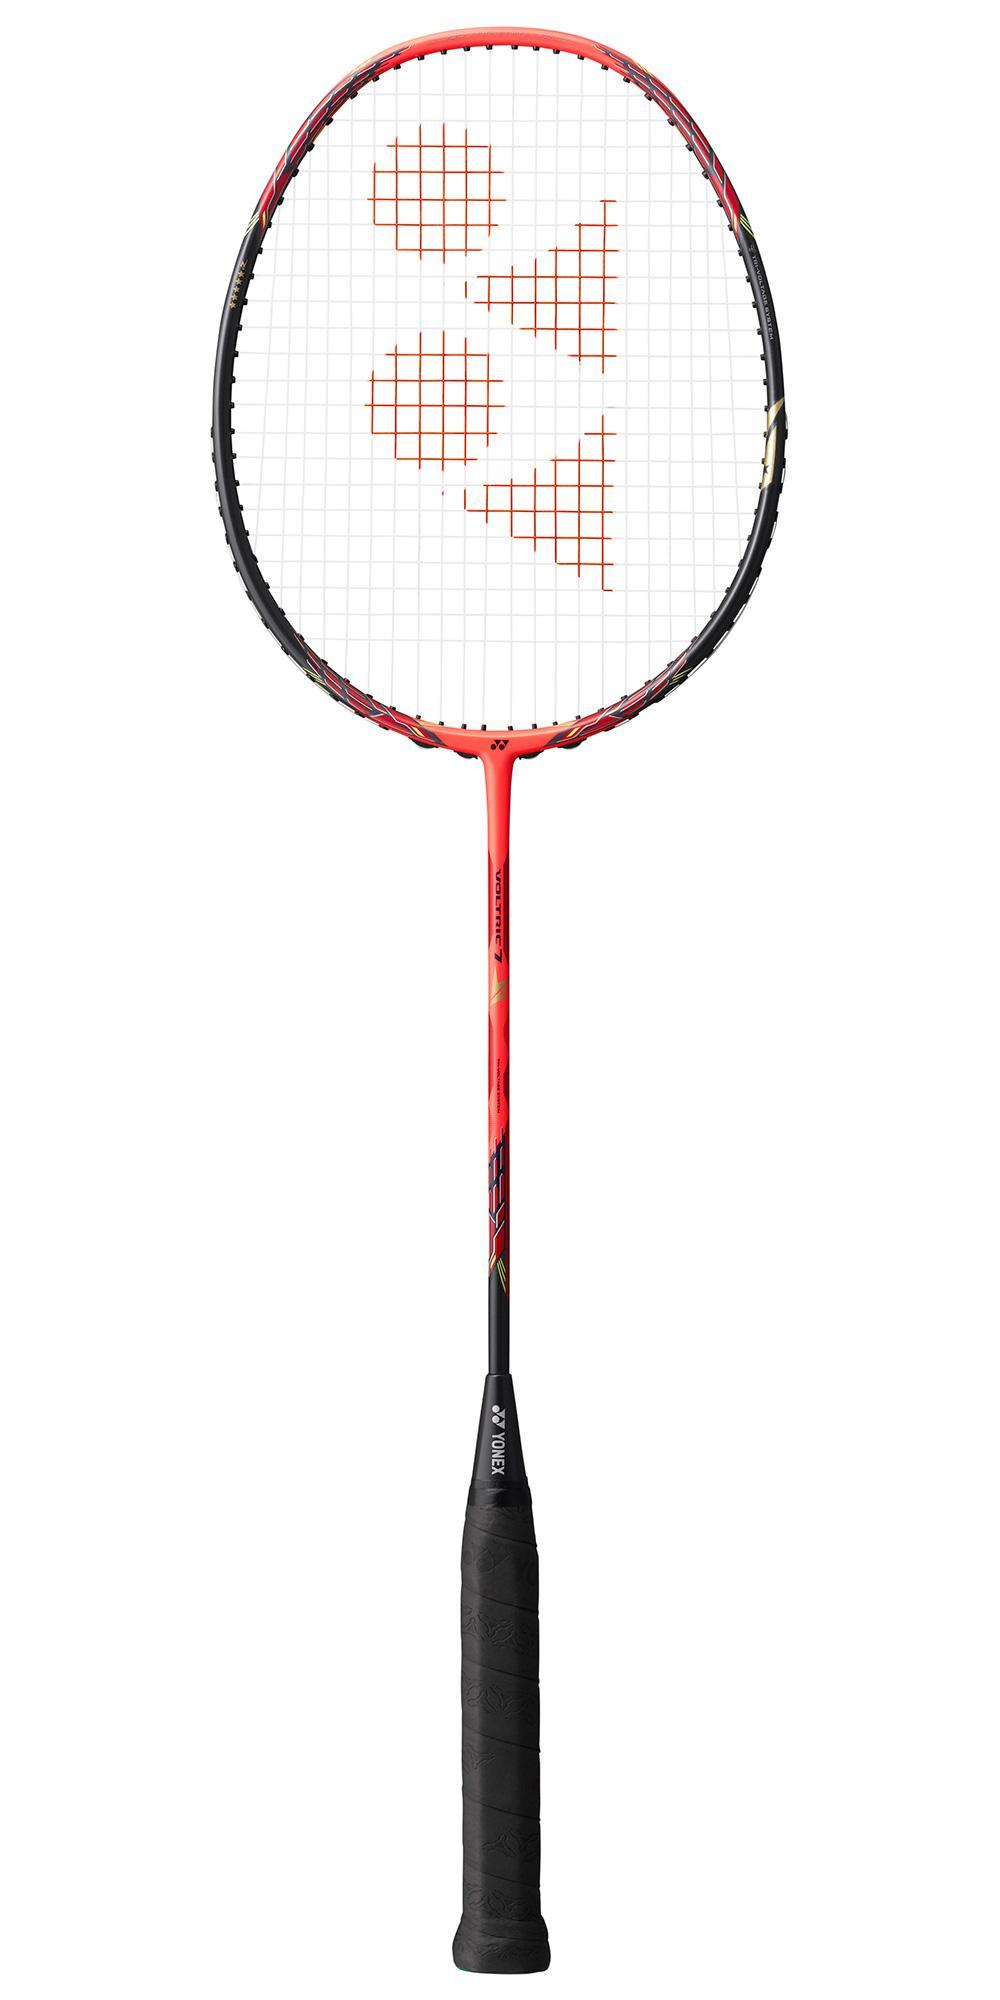 Yonex Voltric 7 Lin Dan Limited Edition Badminton Racket ...